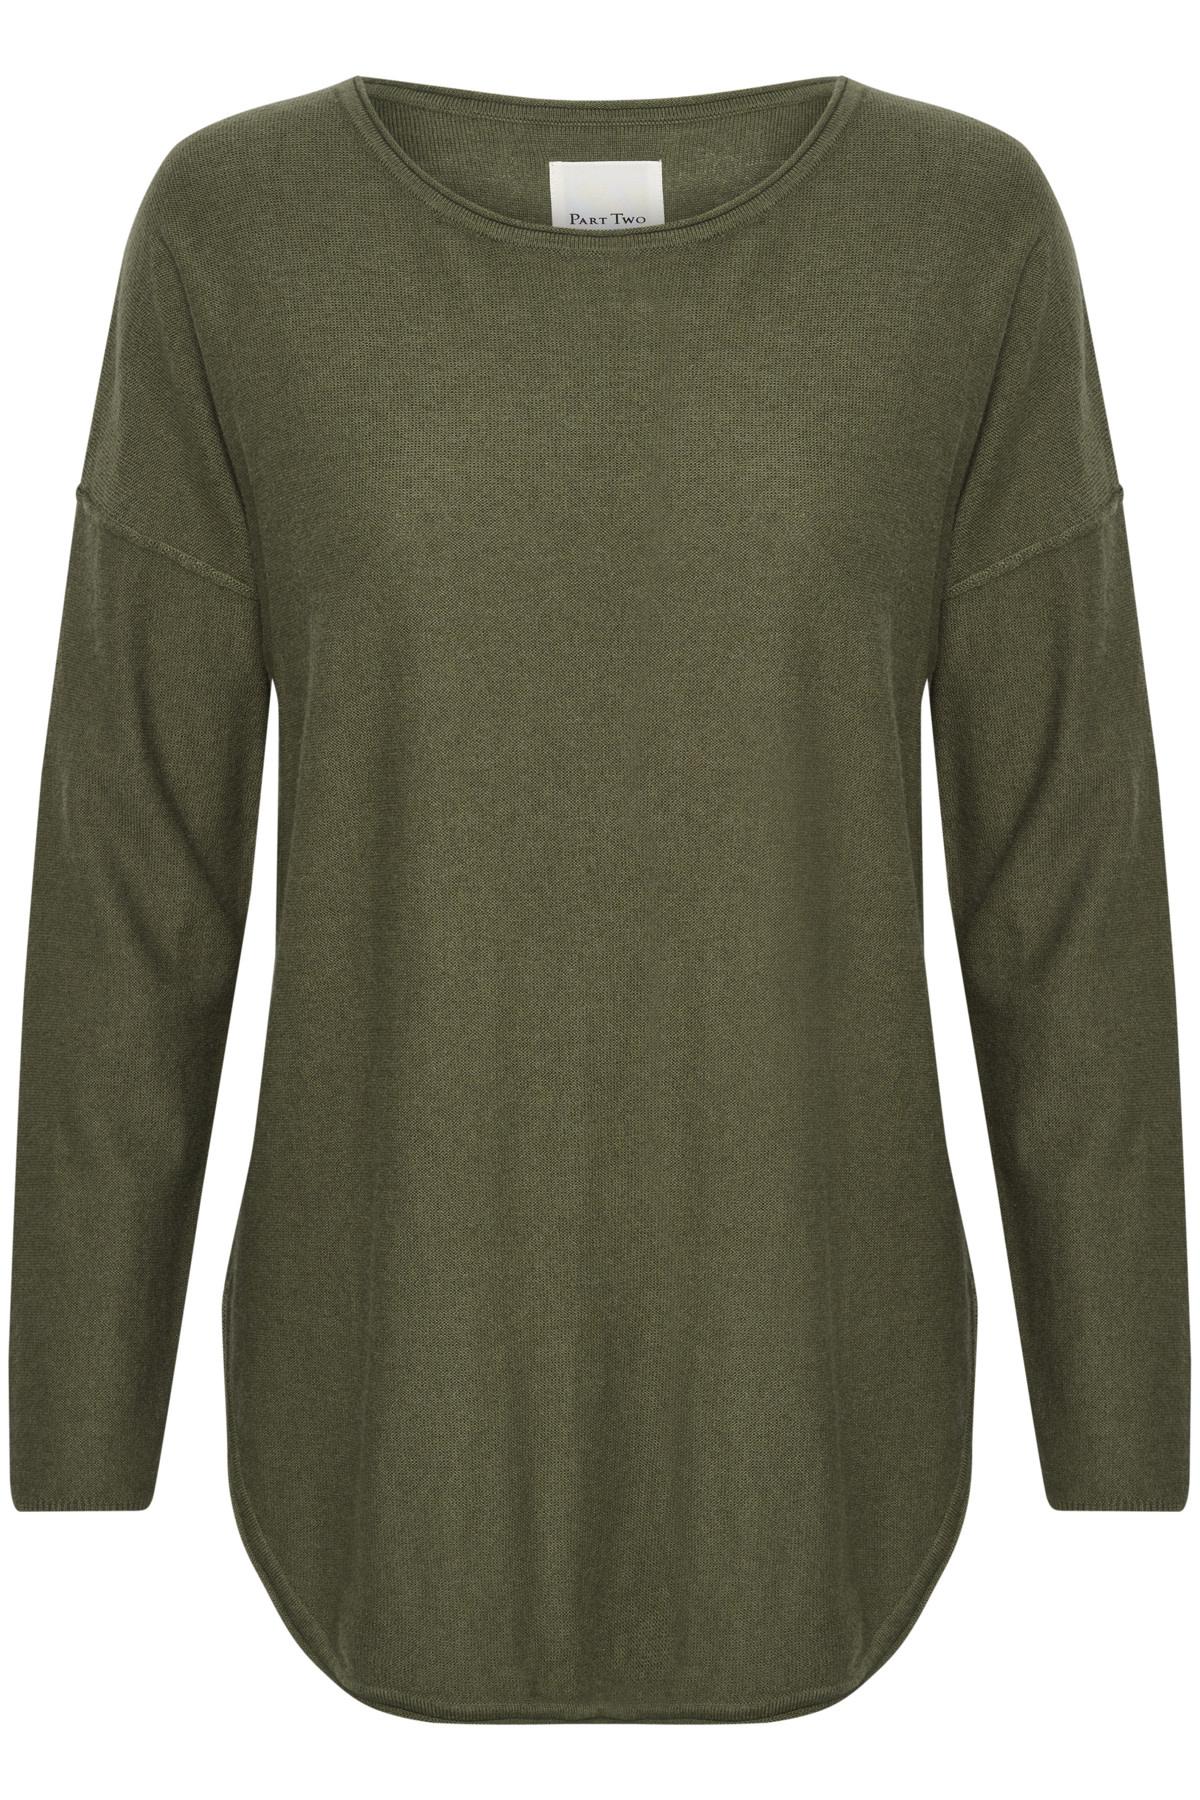 Iliviasa Sweater - Kalamata Green